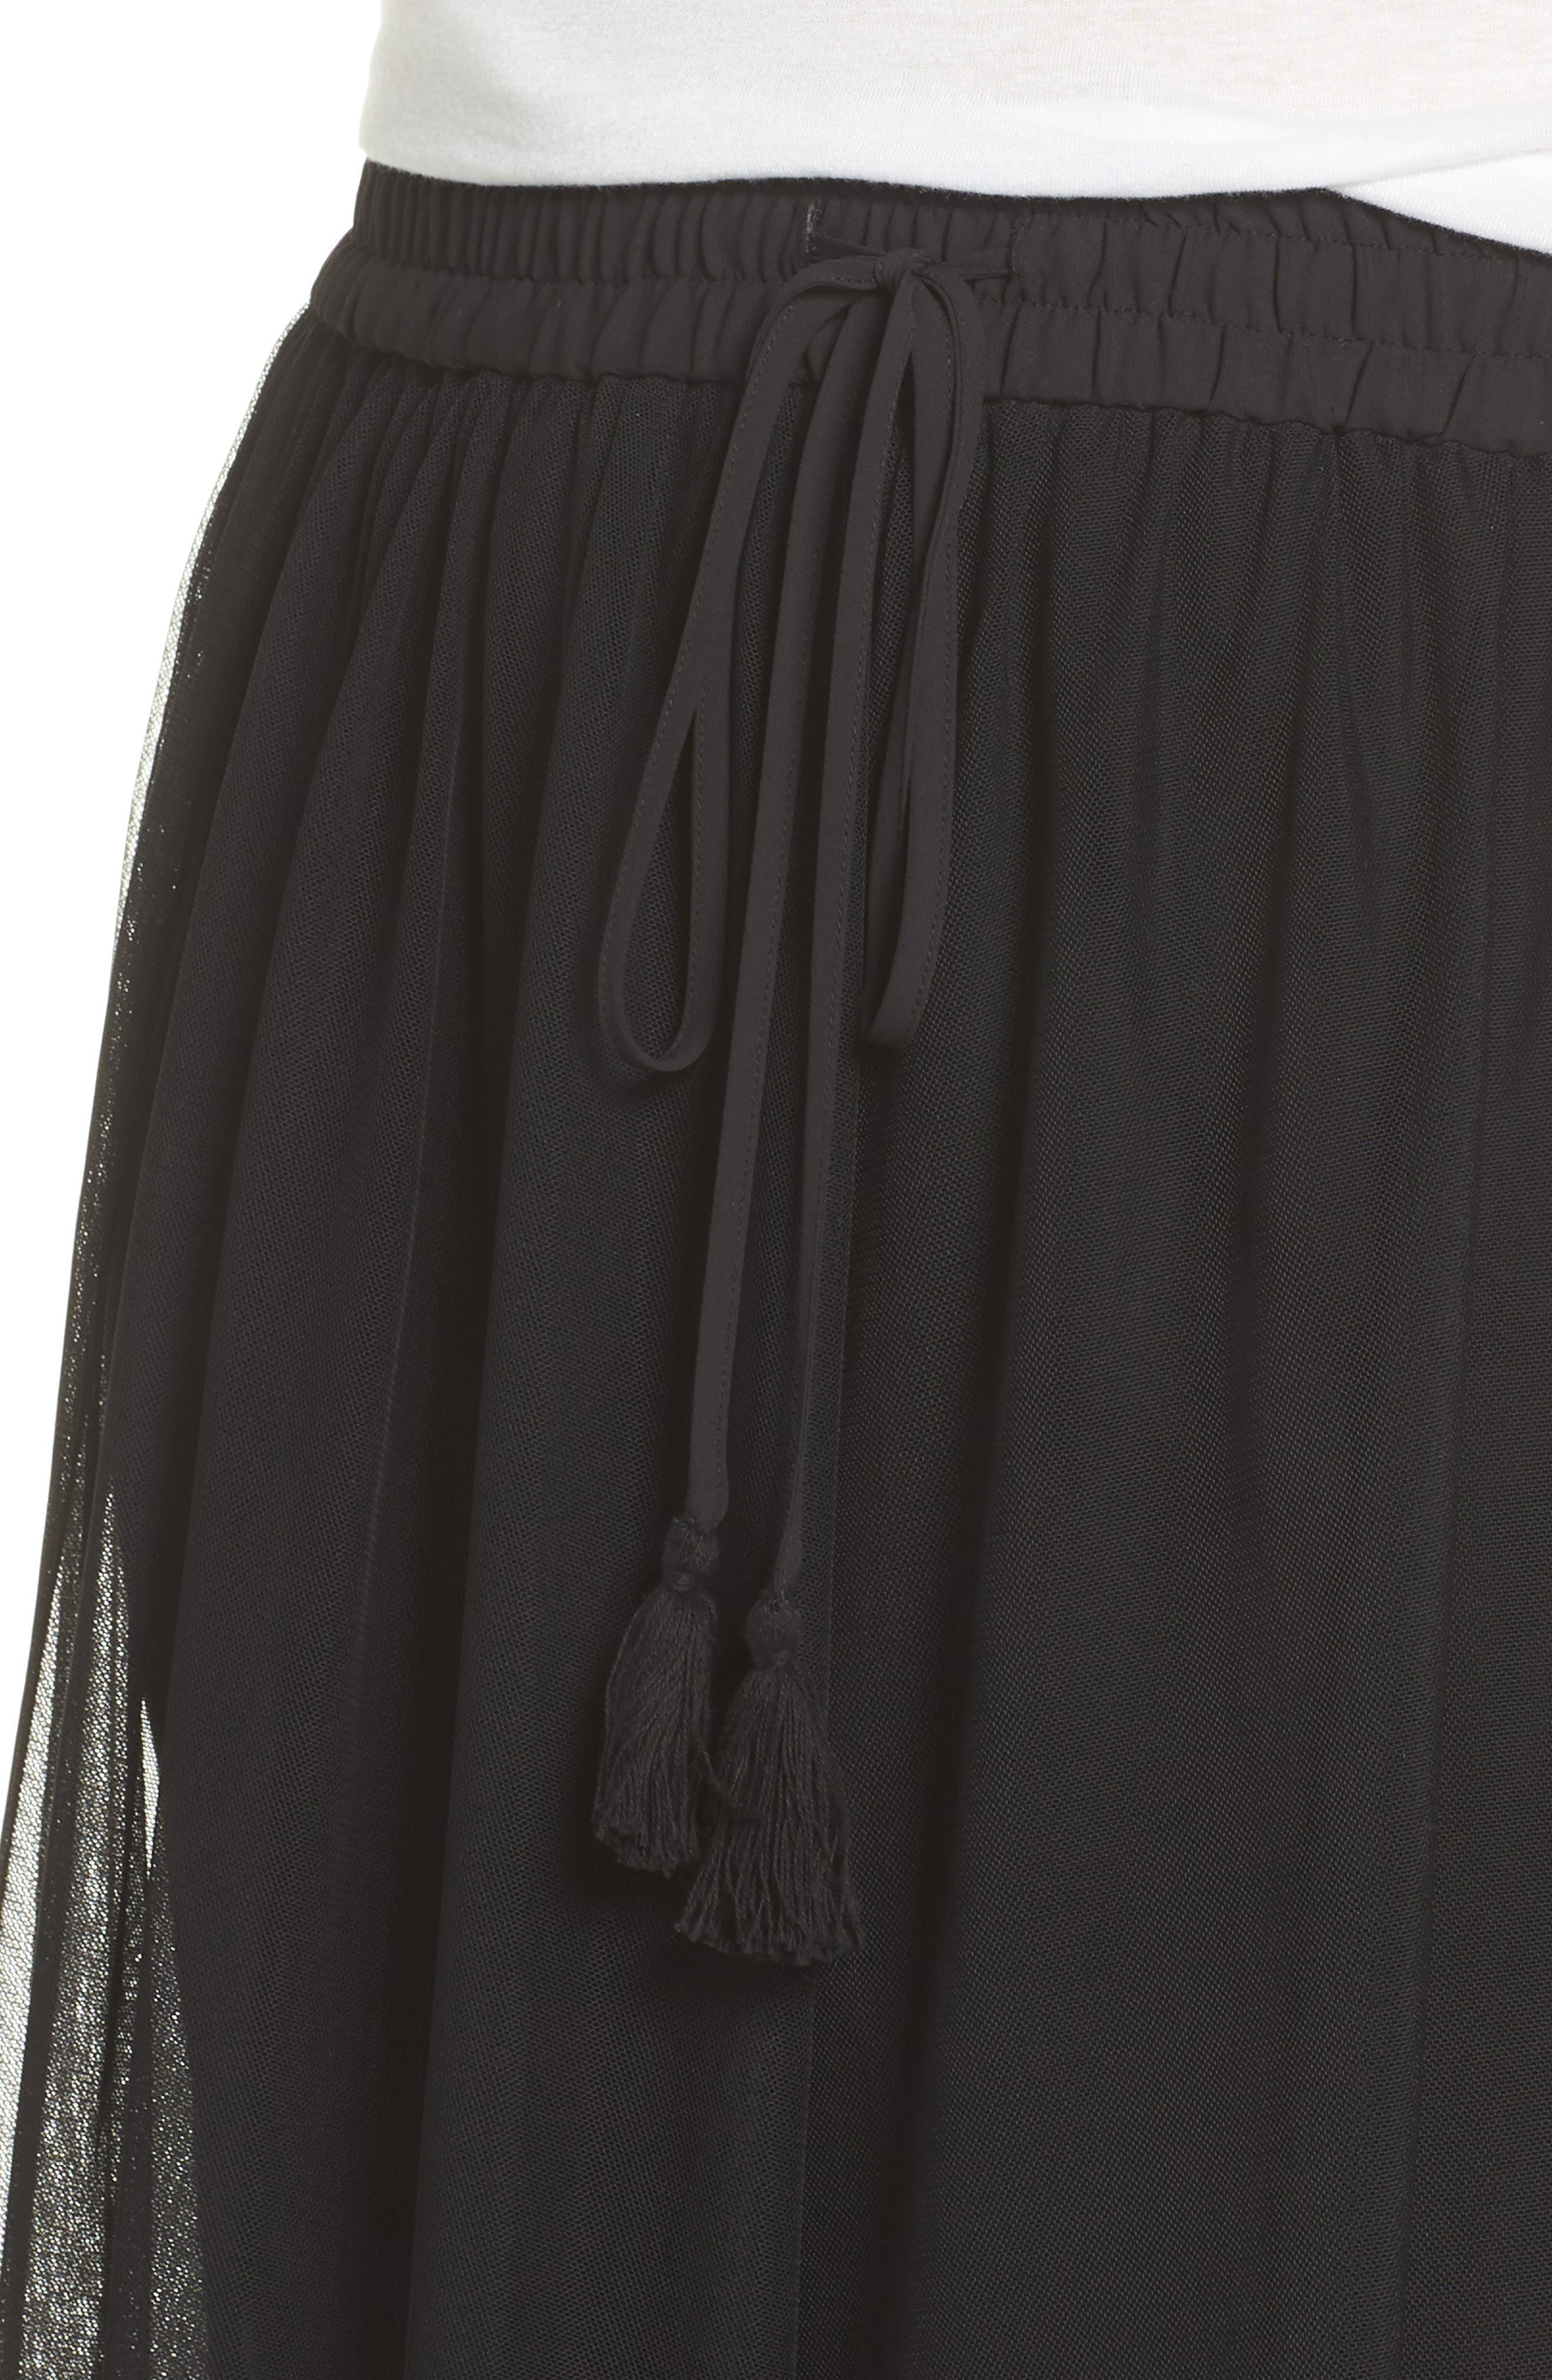 Side Tie Mesh Overlay Maxi Skirt,                             Alternate thumbnail 4, color,                             Rich Black